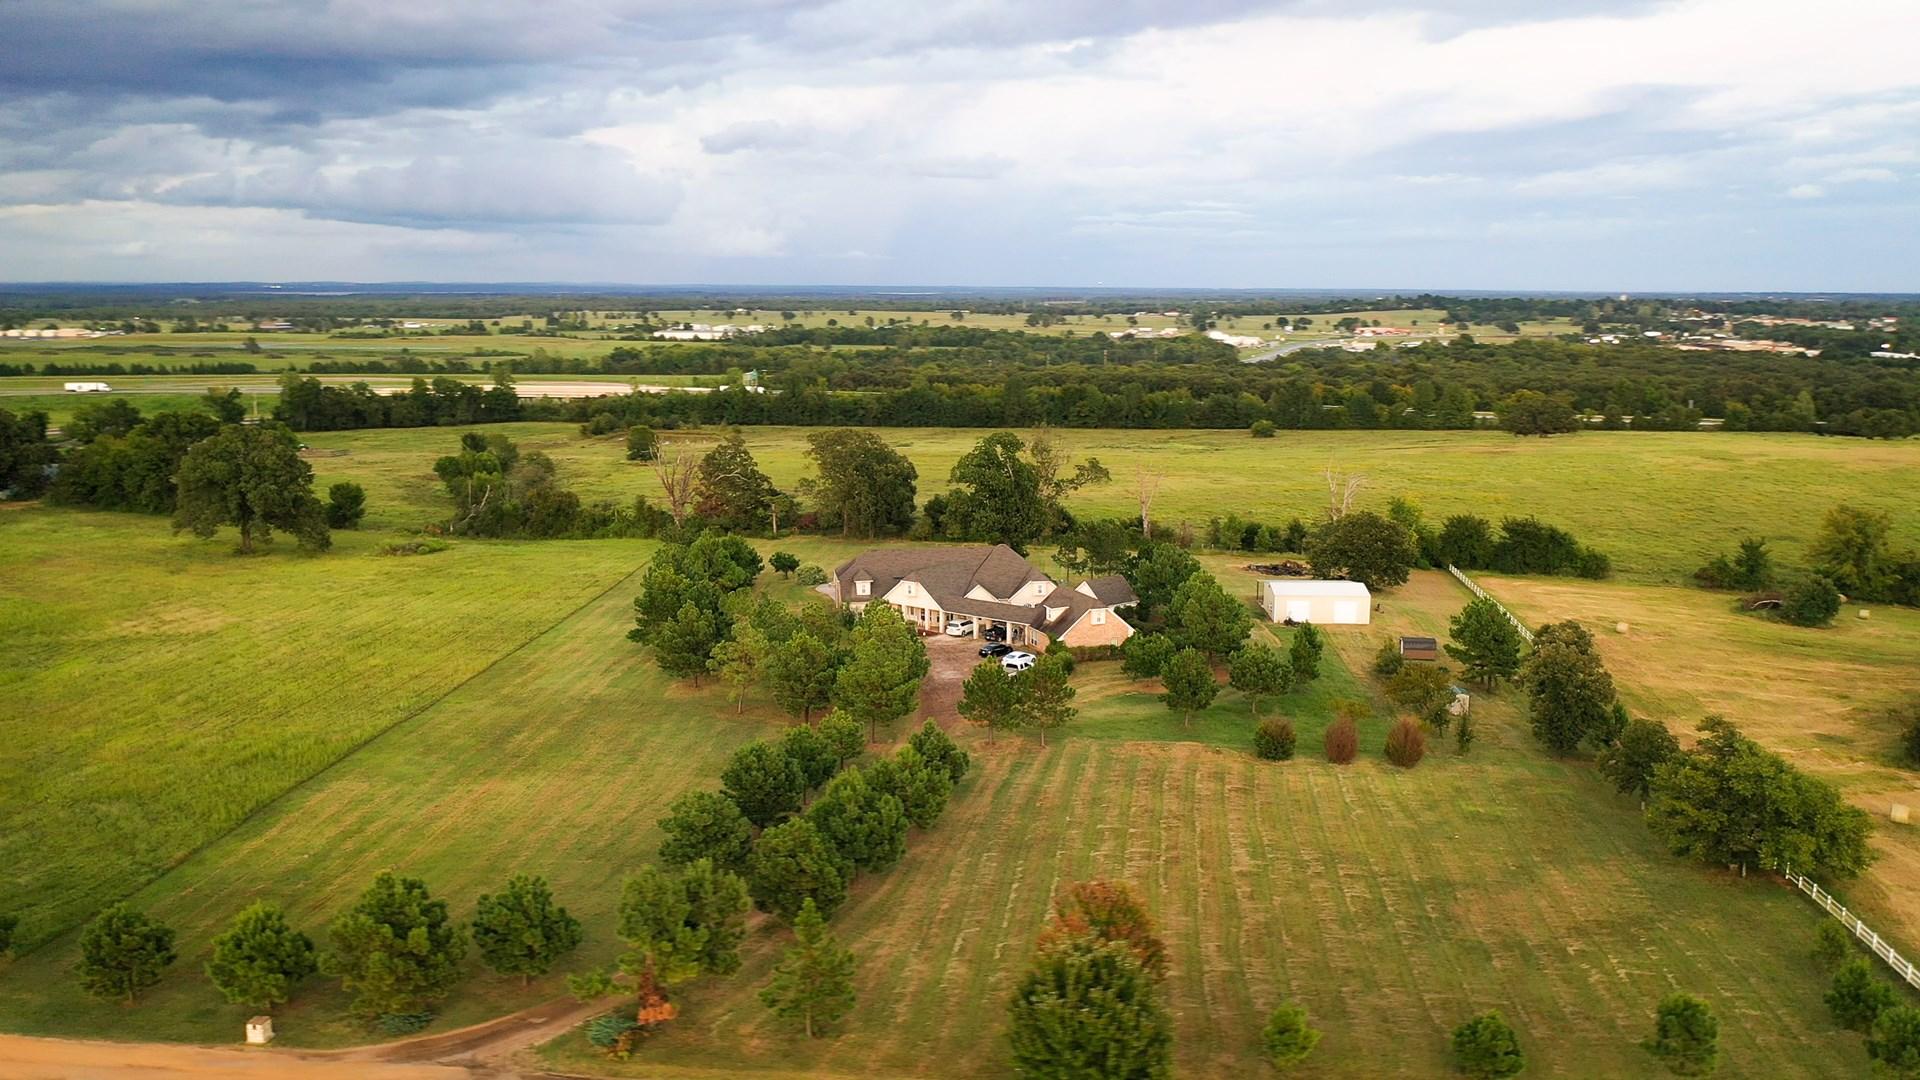 Country Home On Acreage For Sale Hugo Oklahoma